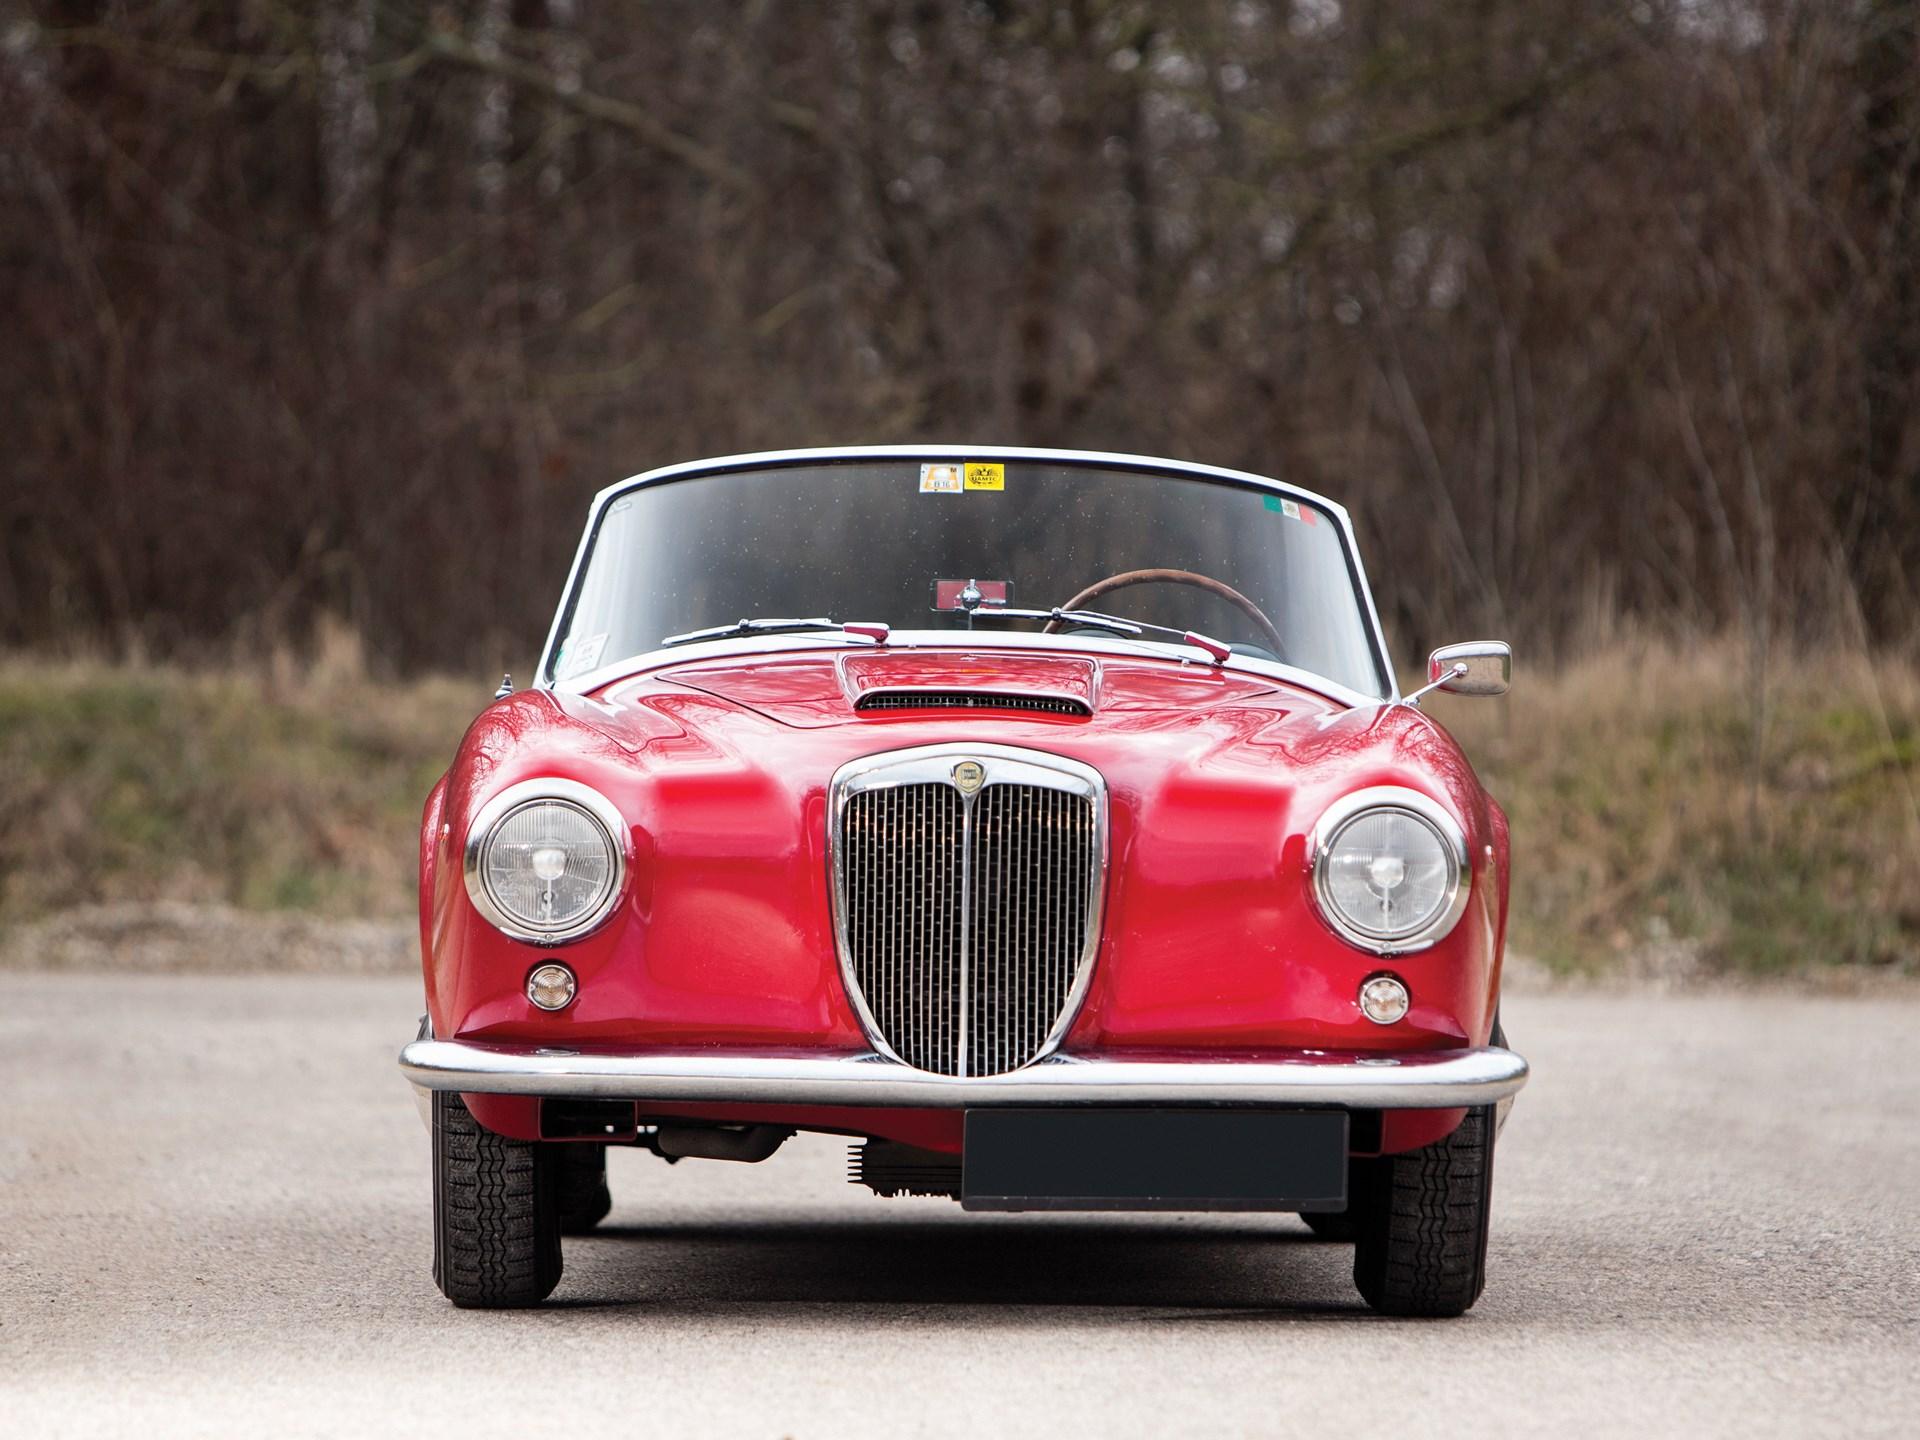 rm sotheby's - 1958 lancia aurelia b24s convertiblepinin farina